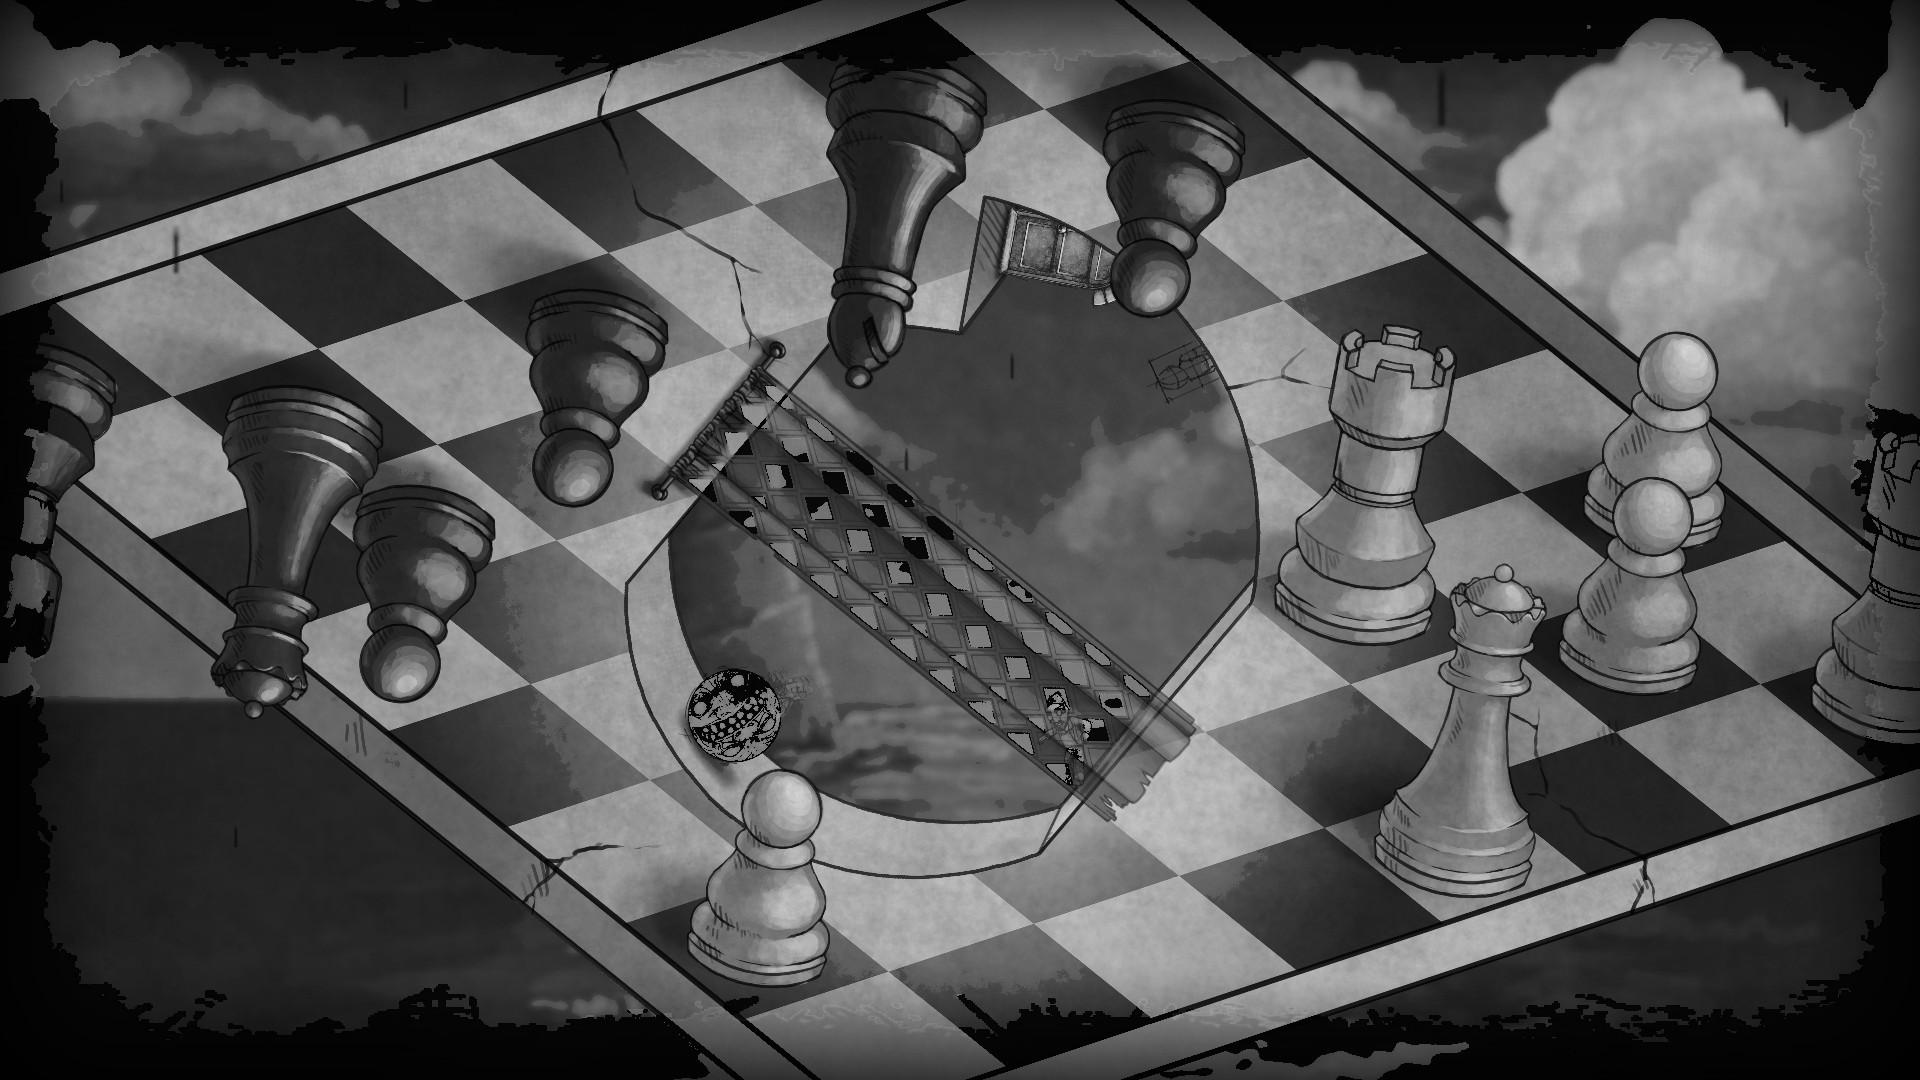 Drawn optical illusion wallpaper Illusion Board Monochrome Pawns Wallpapers